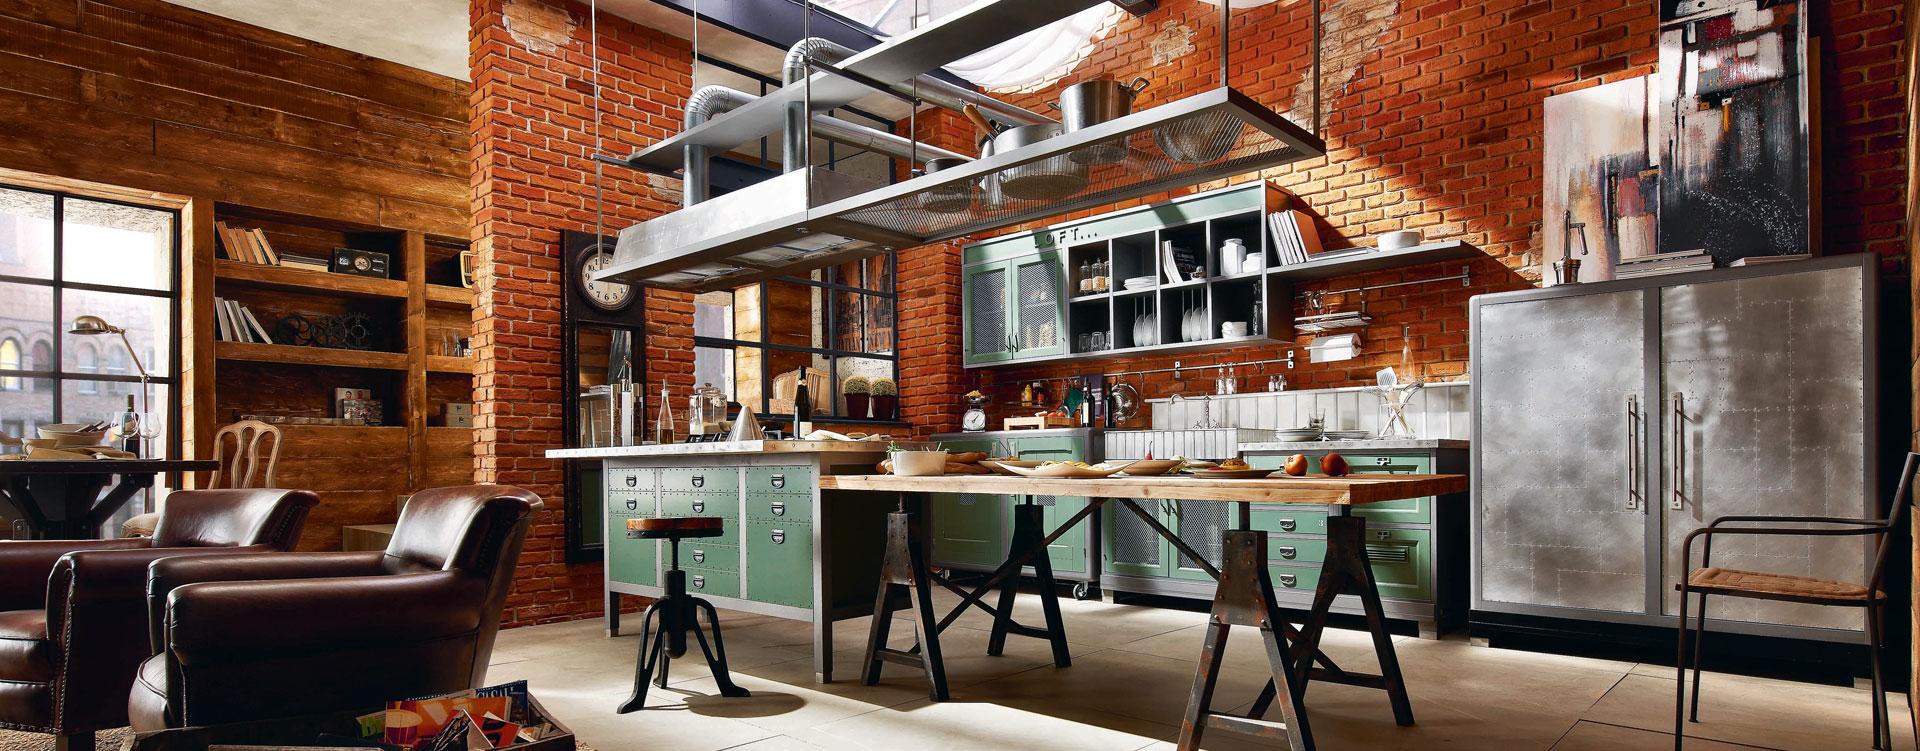 englische landhausk che modern. Black Bedroom Furniture Sets. Home Design Ideas